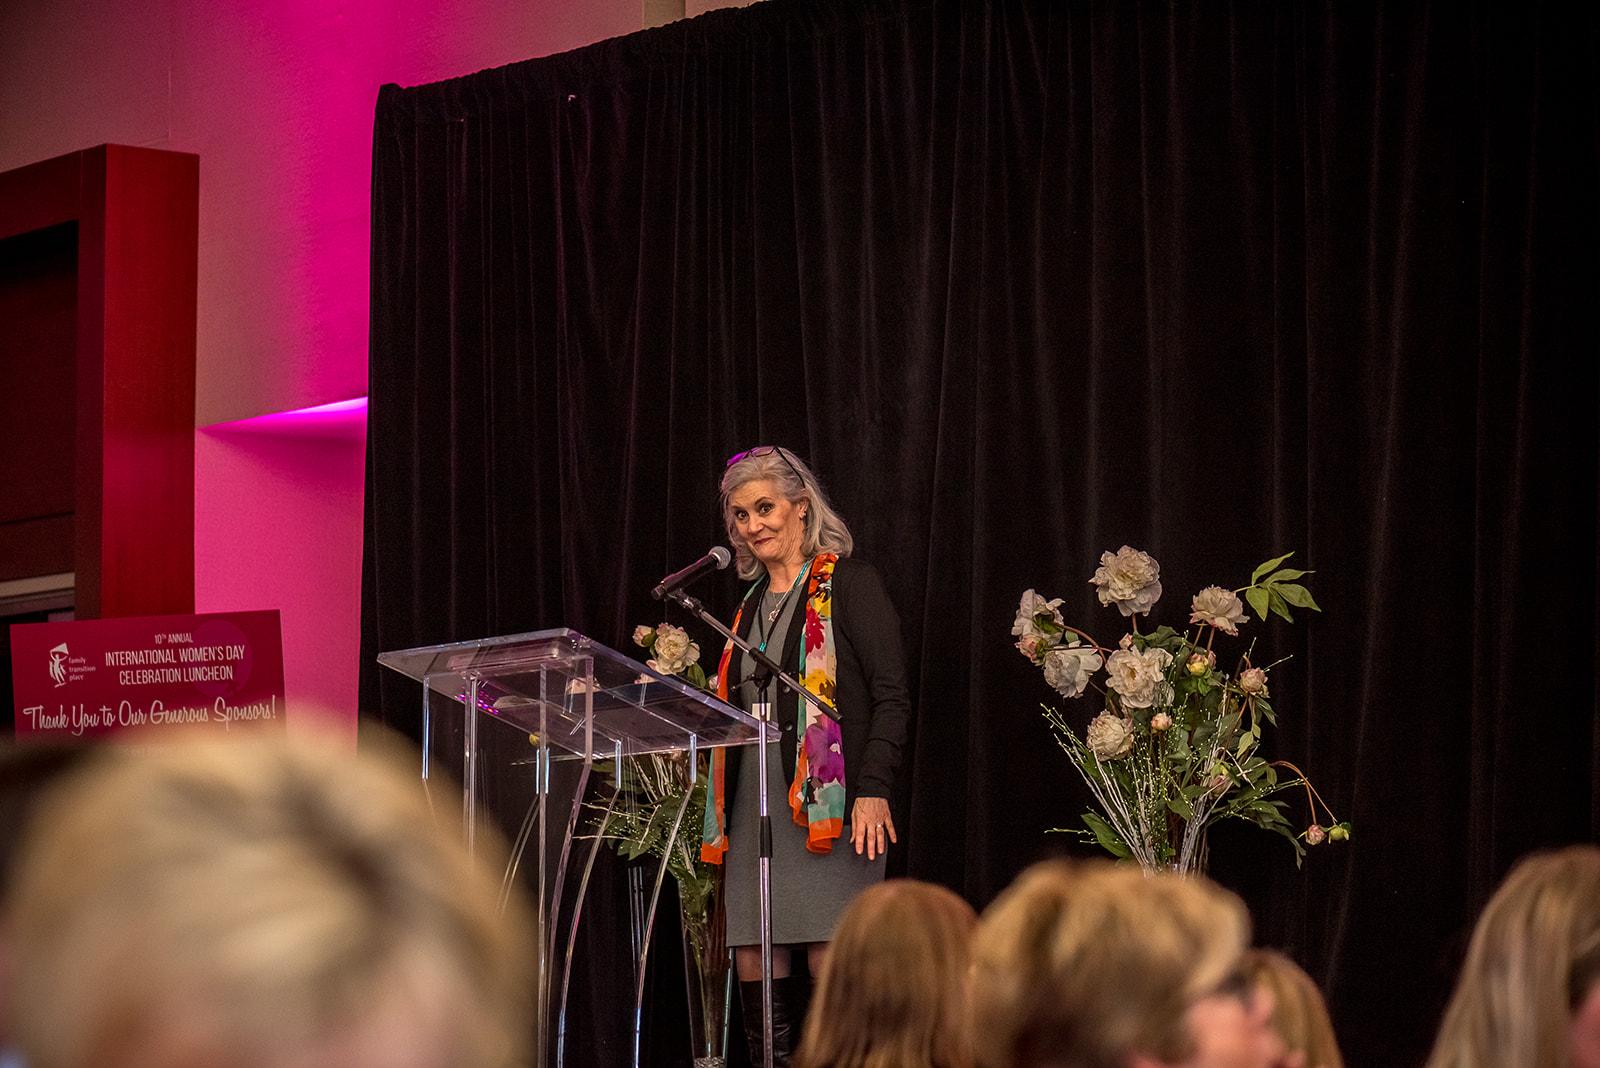 2020 International Women's Day Celebration Luncheon